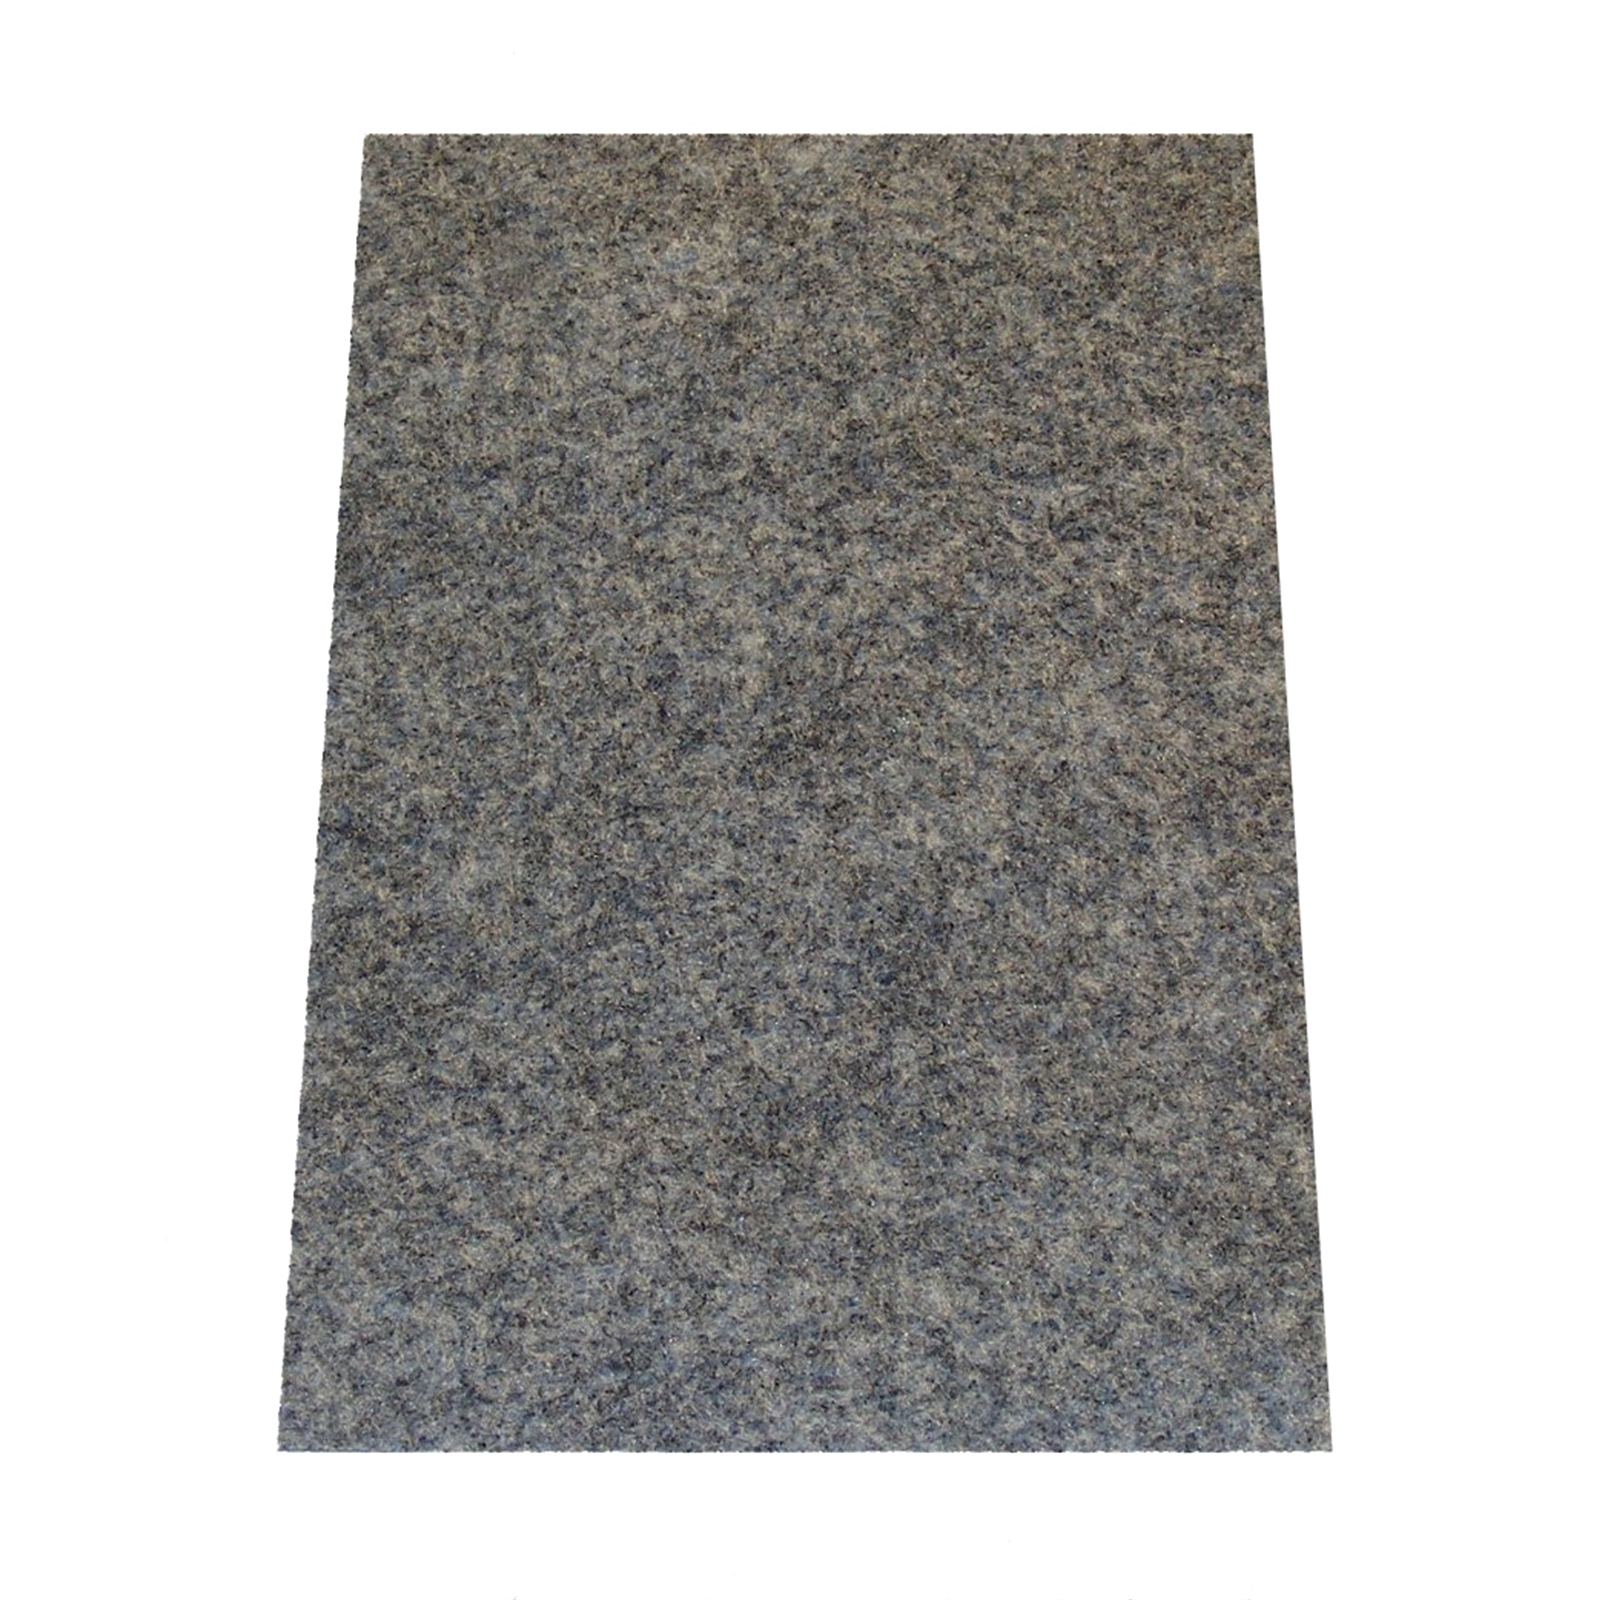 Ideal DIY Eildon Denim Flat Marine Carpet